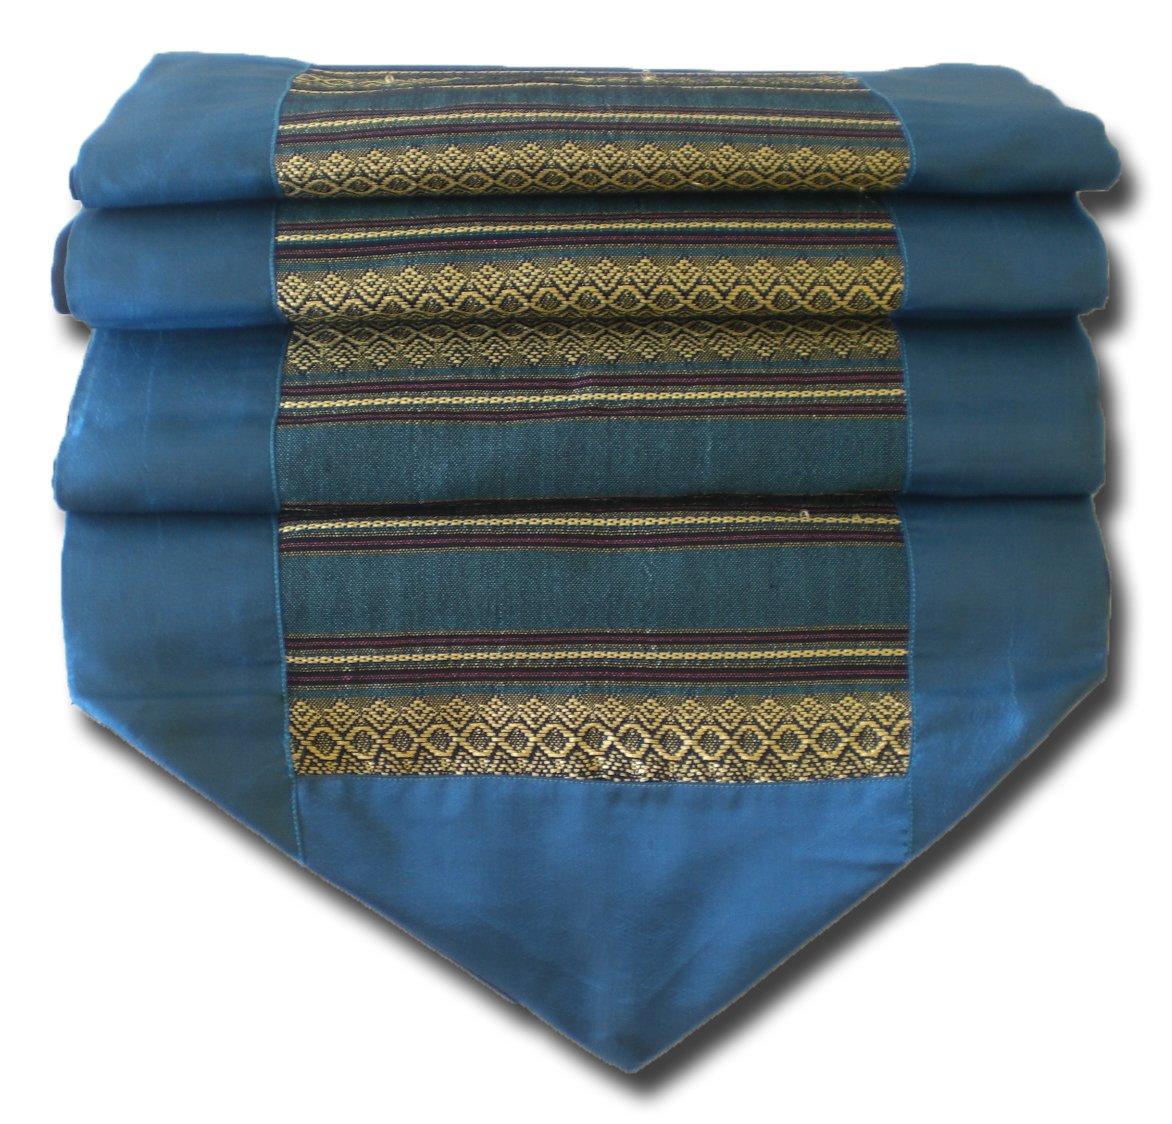 soljo - tablecloth tablerunner table runner linen Thai Silk Elegant precious stripped 200 cm x 30 cm many colors (jade) by by soljo